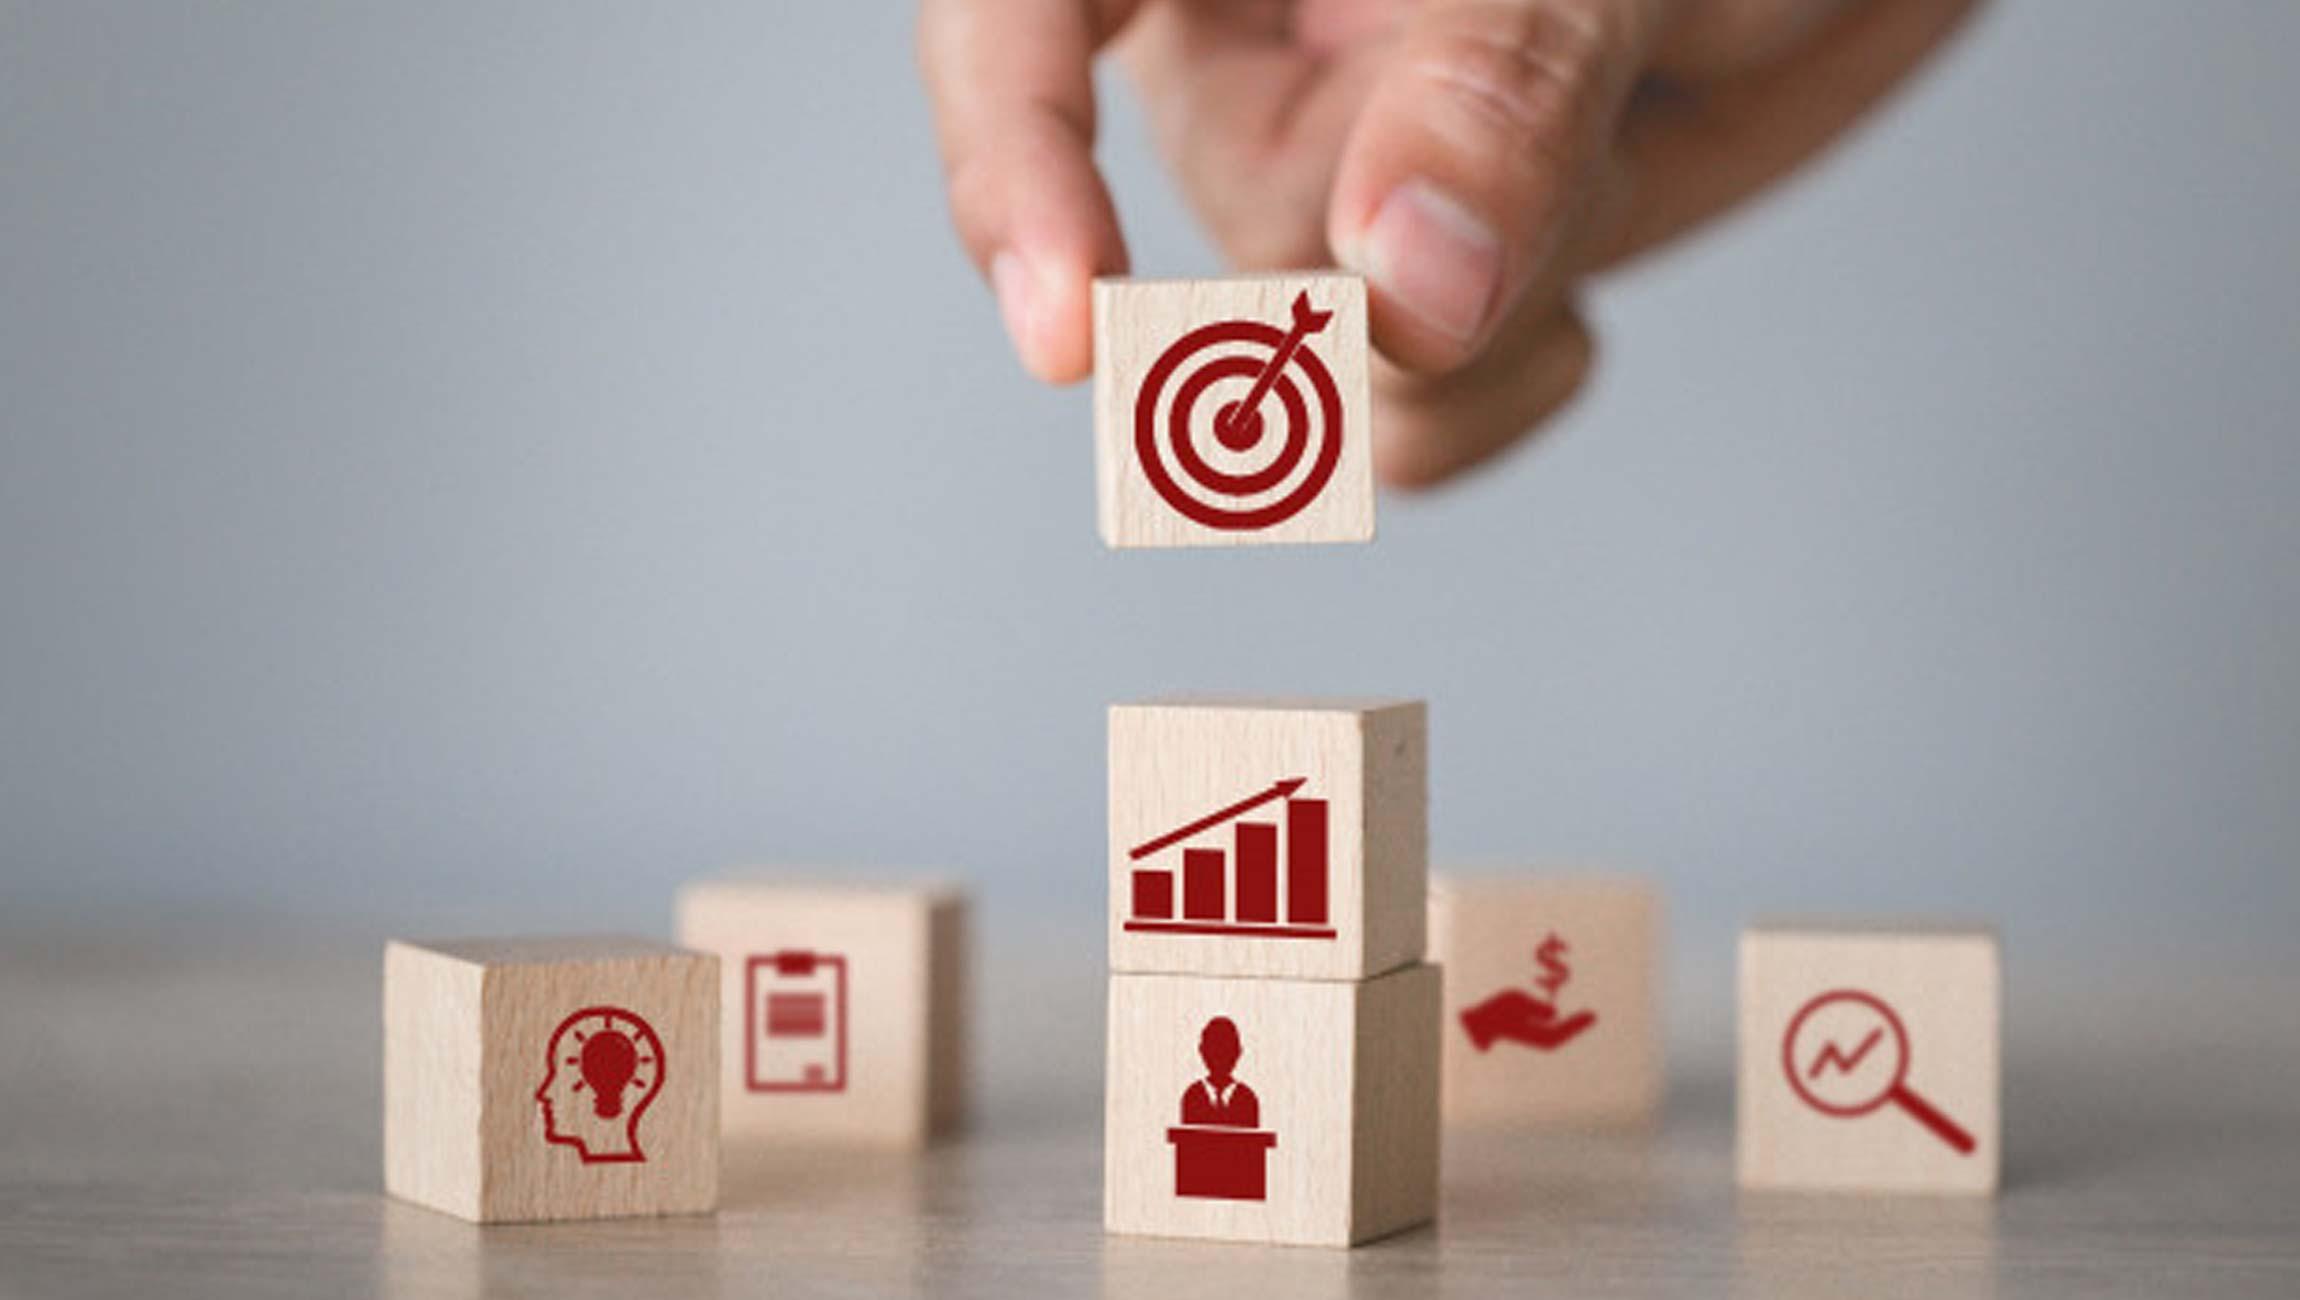 Mavrck Announces Strategic Partnership With Awin Group to Power Influencer Marketing Success 1